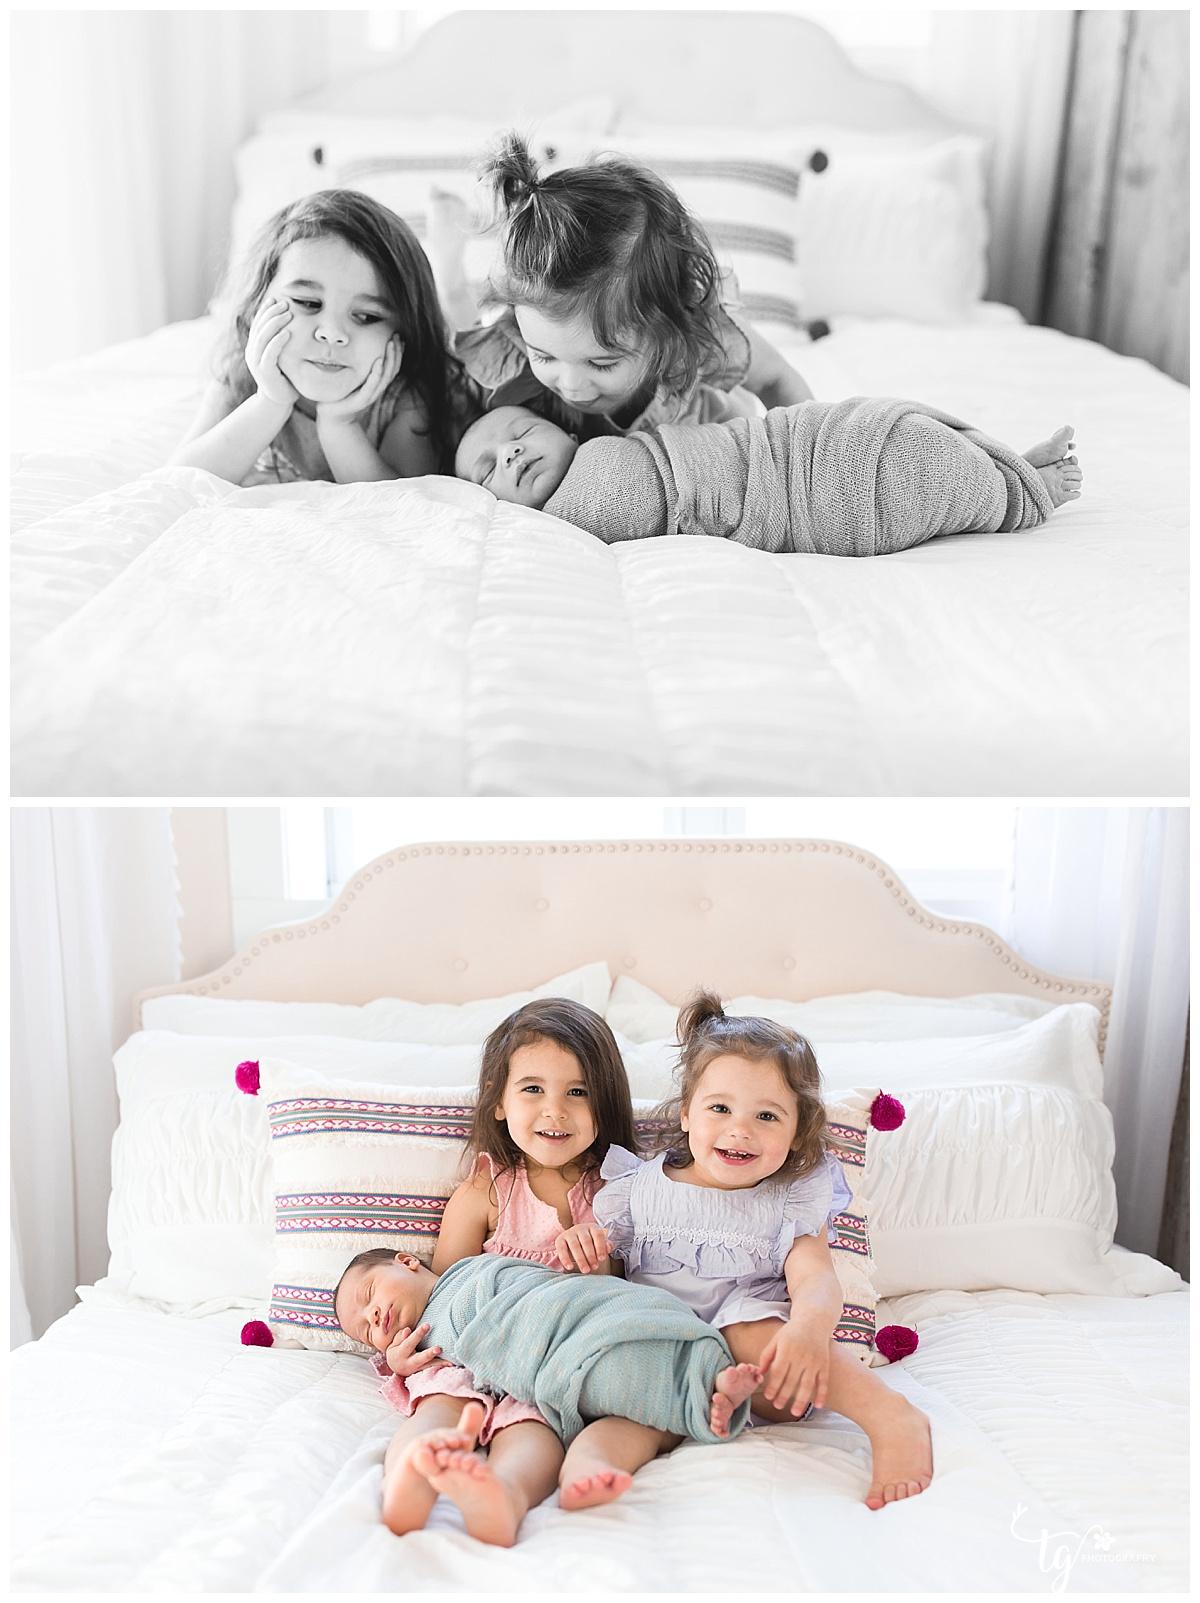 Newborn photographer for family photos